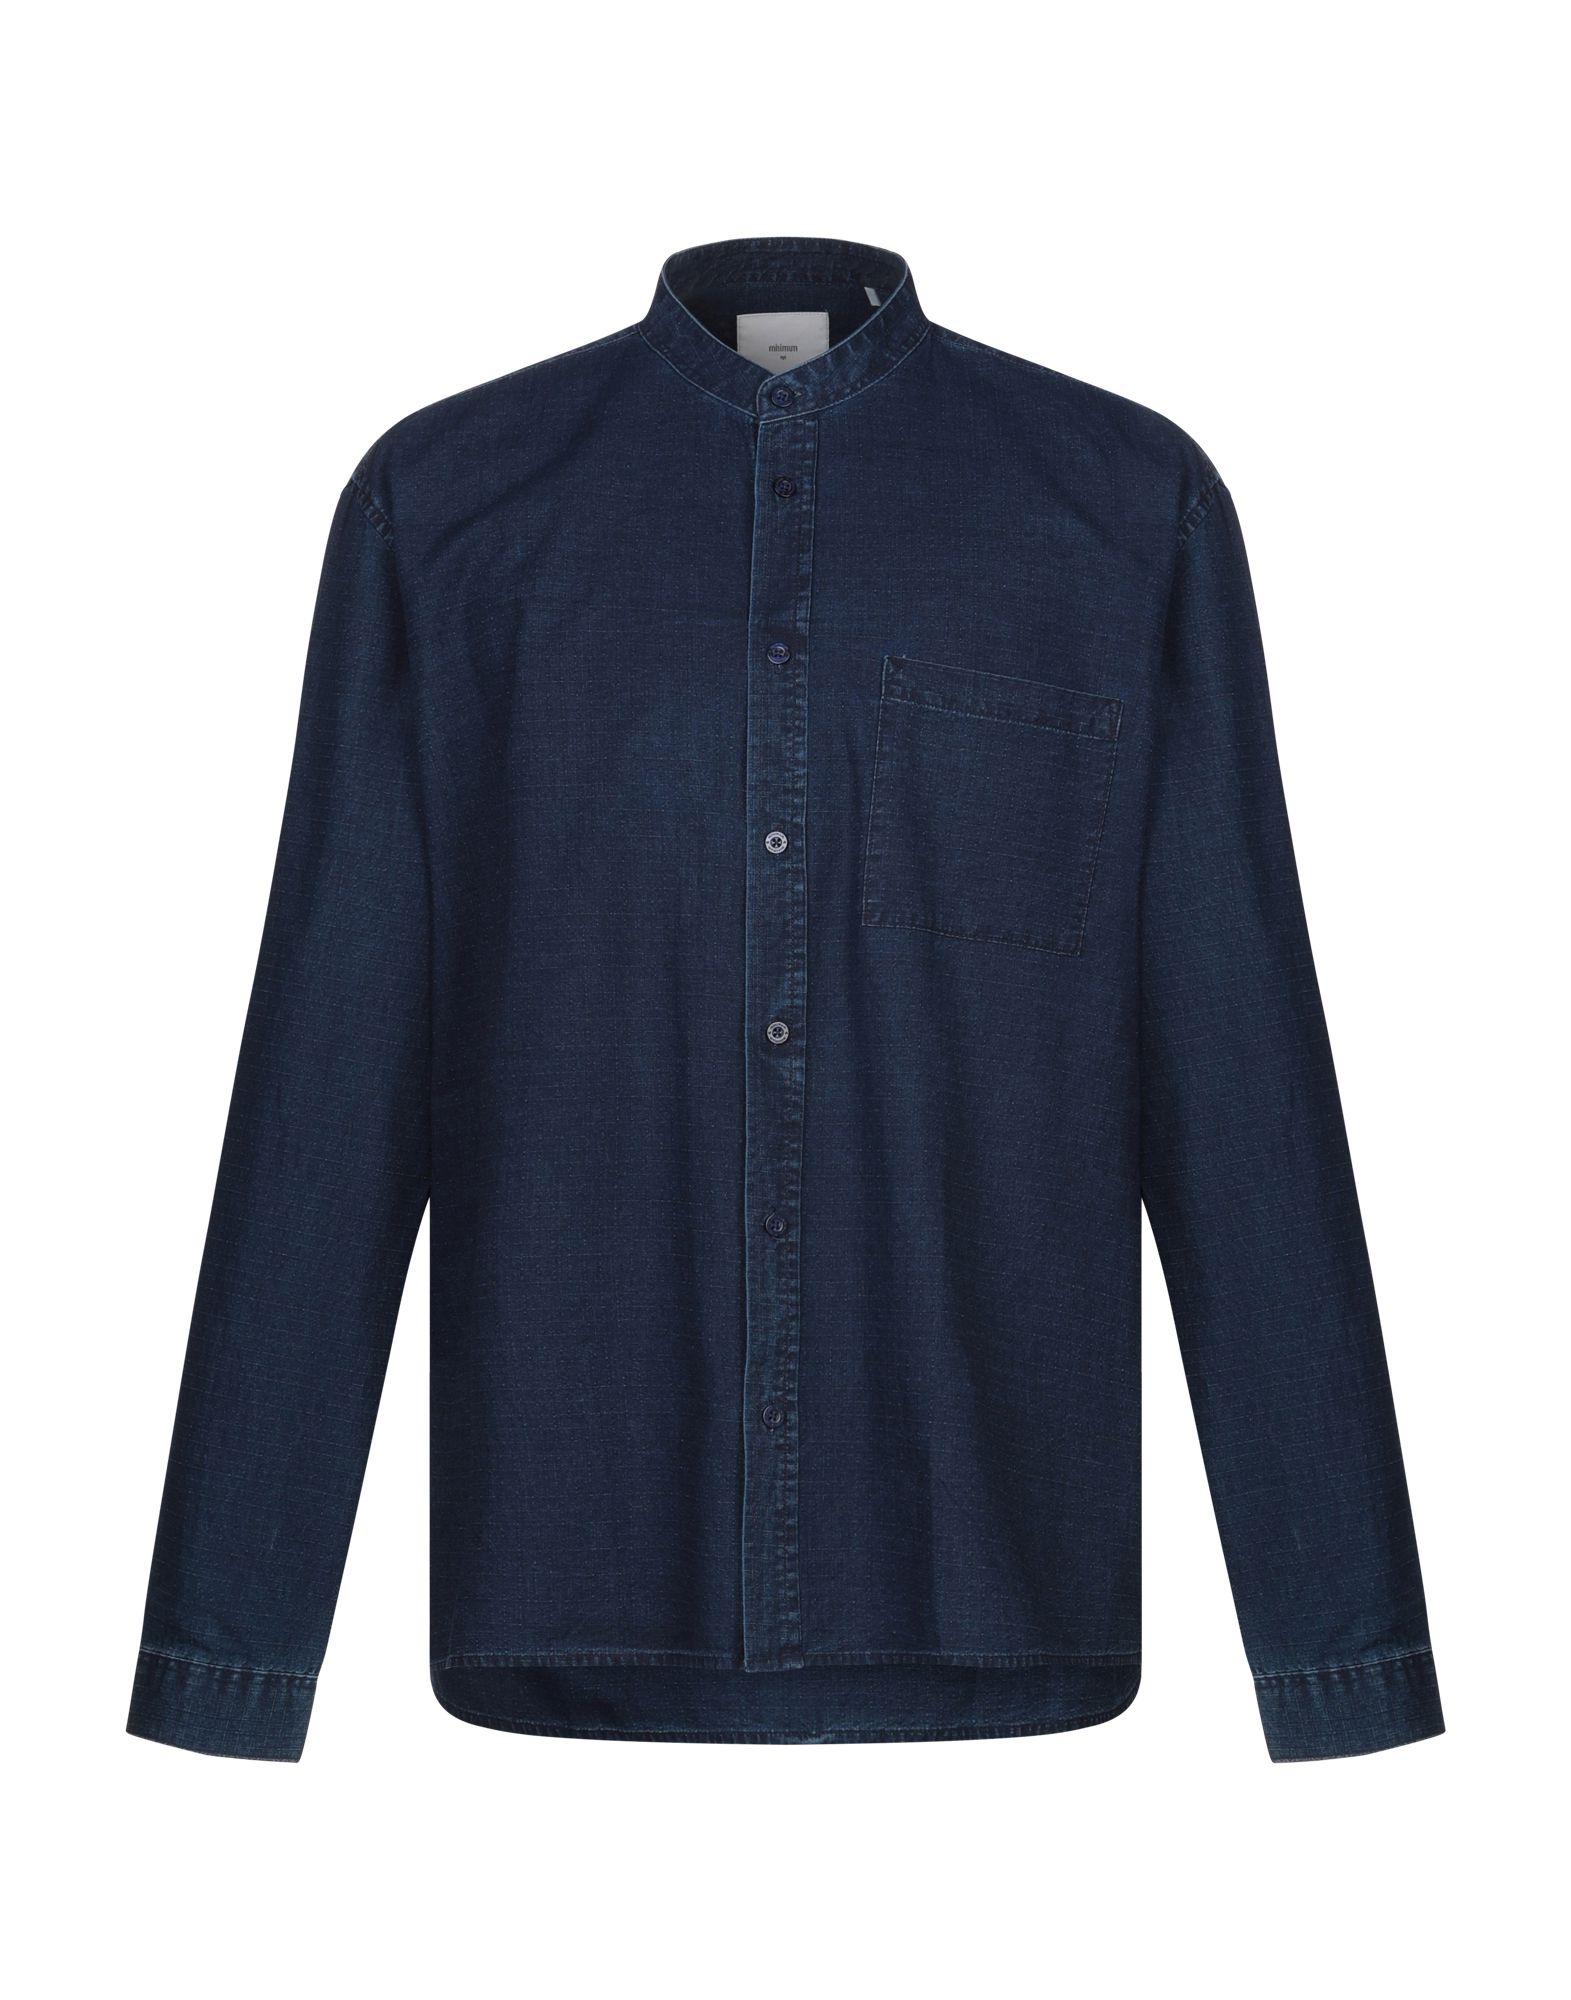 MINIMUM Джинсовая рубашка